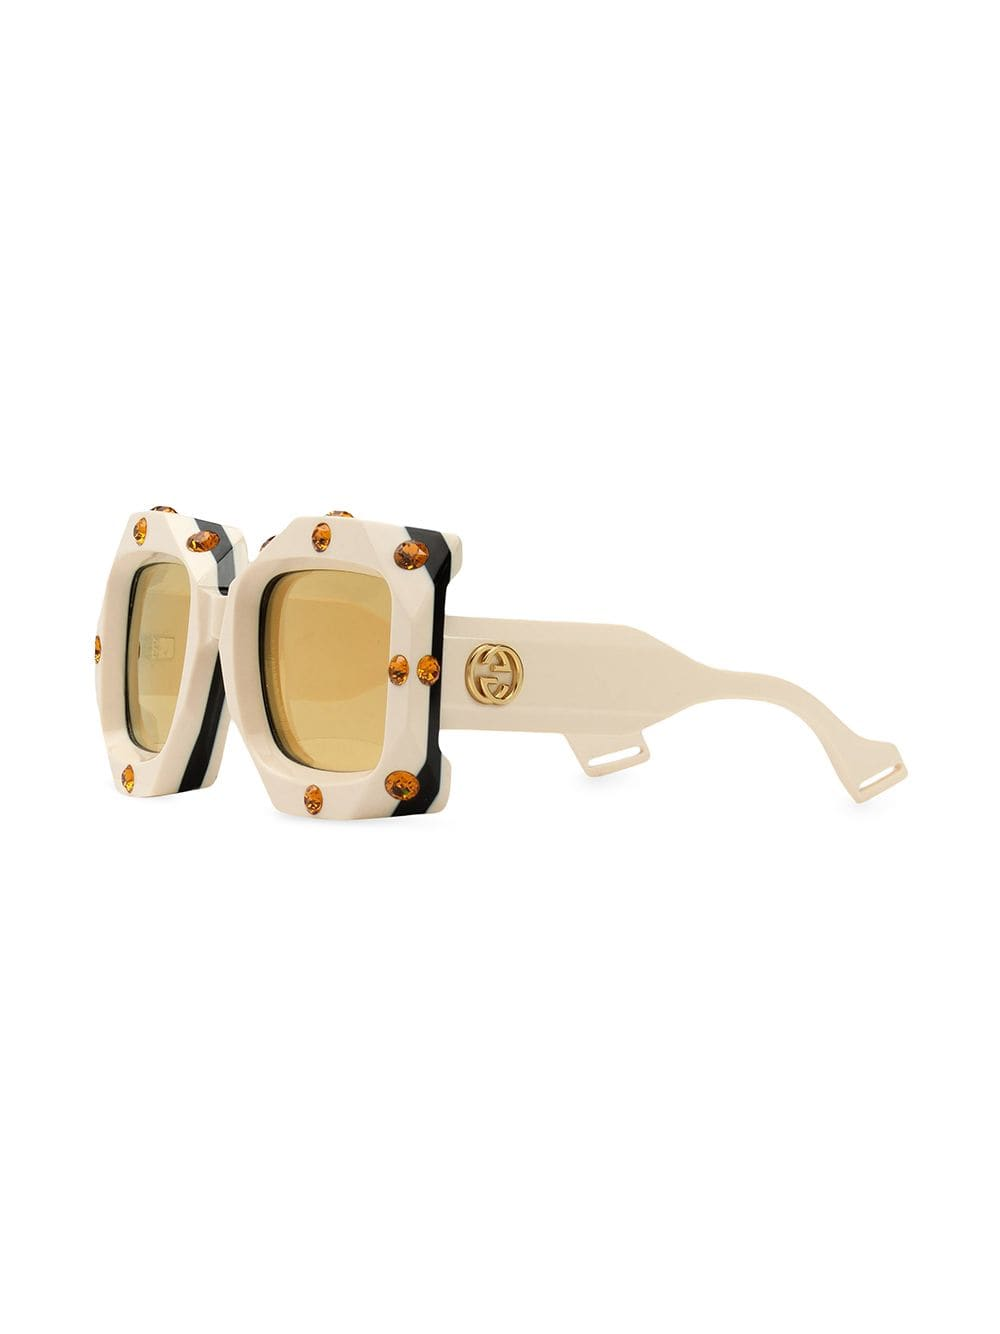 47b84b04a6 Eyewear gafas de sol con detalles de cristal - neutro